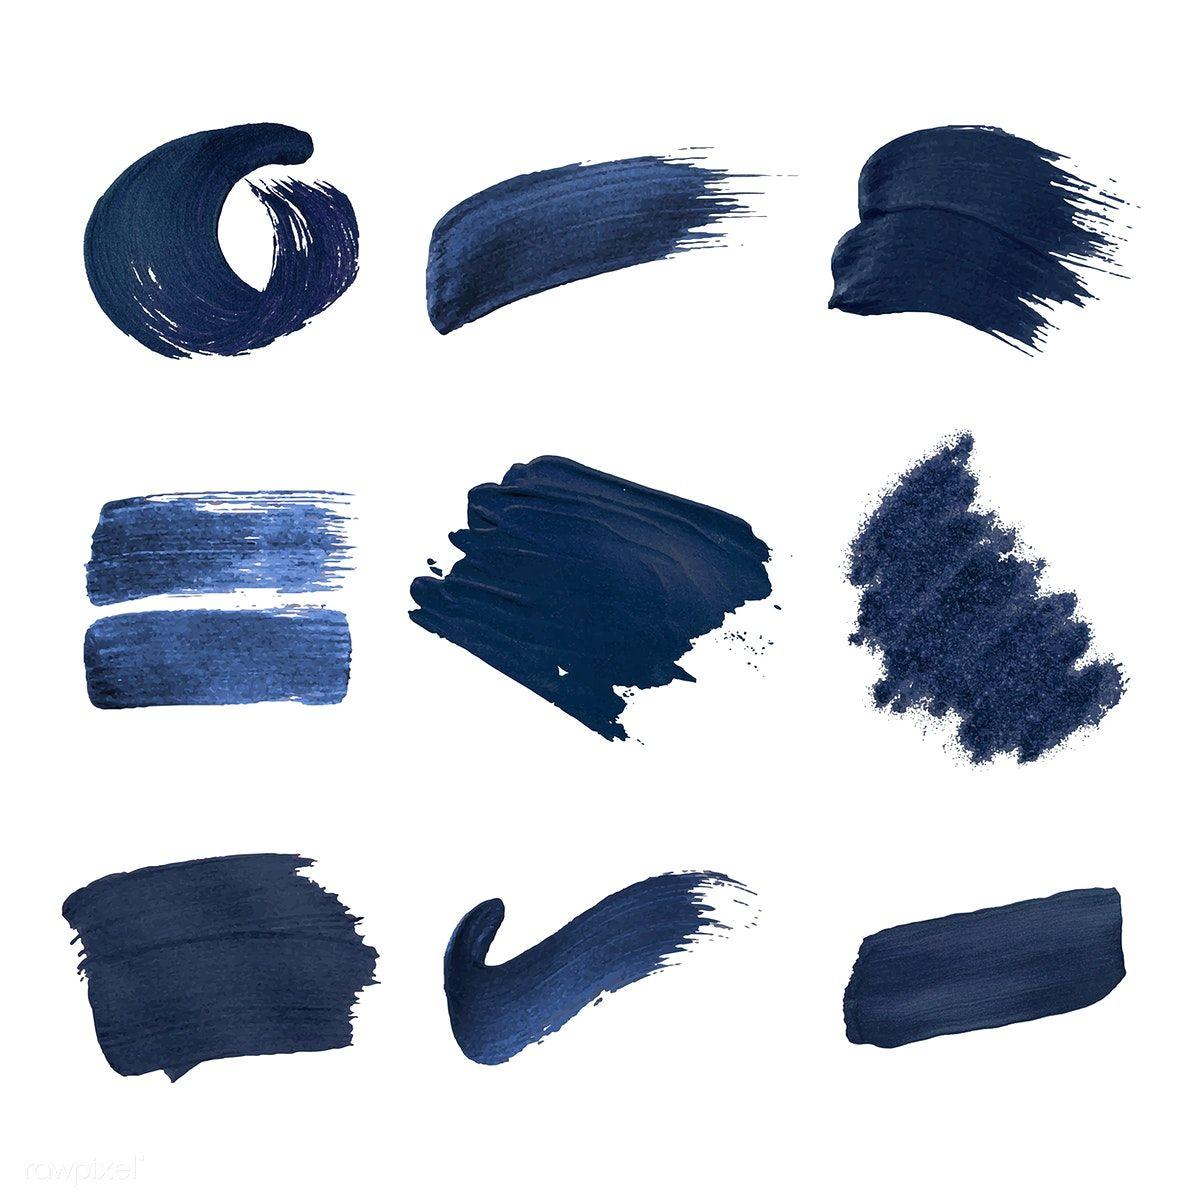 Navy Blue Aesthetic Grunge